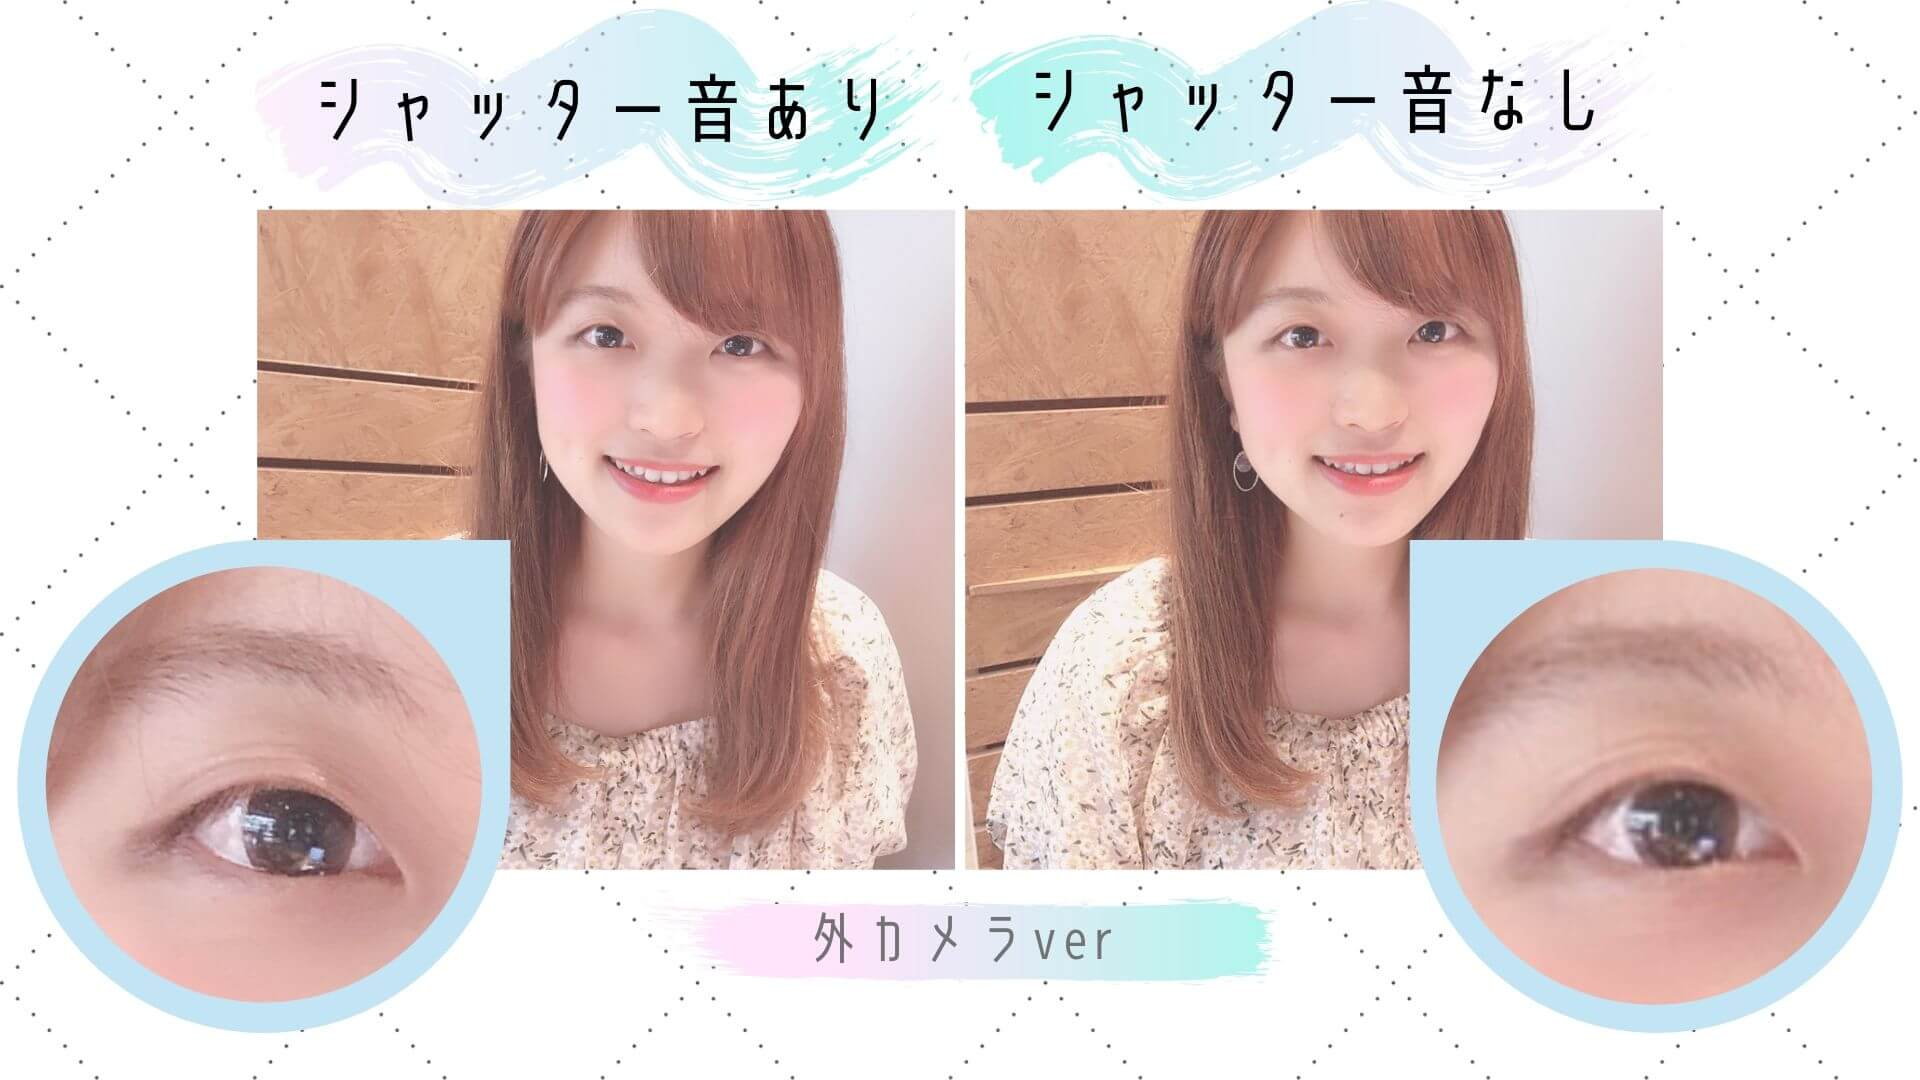 Ulikeの外カメラの画質比較(シャッター音有無)